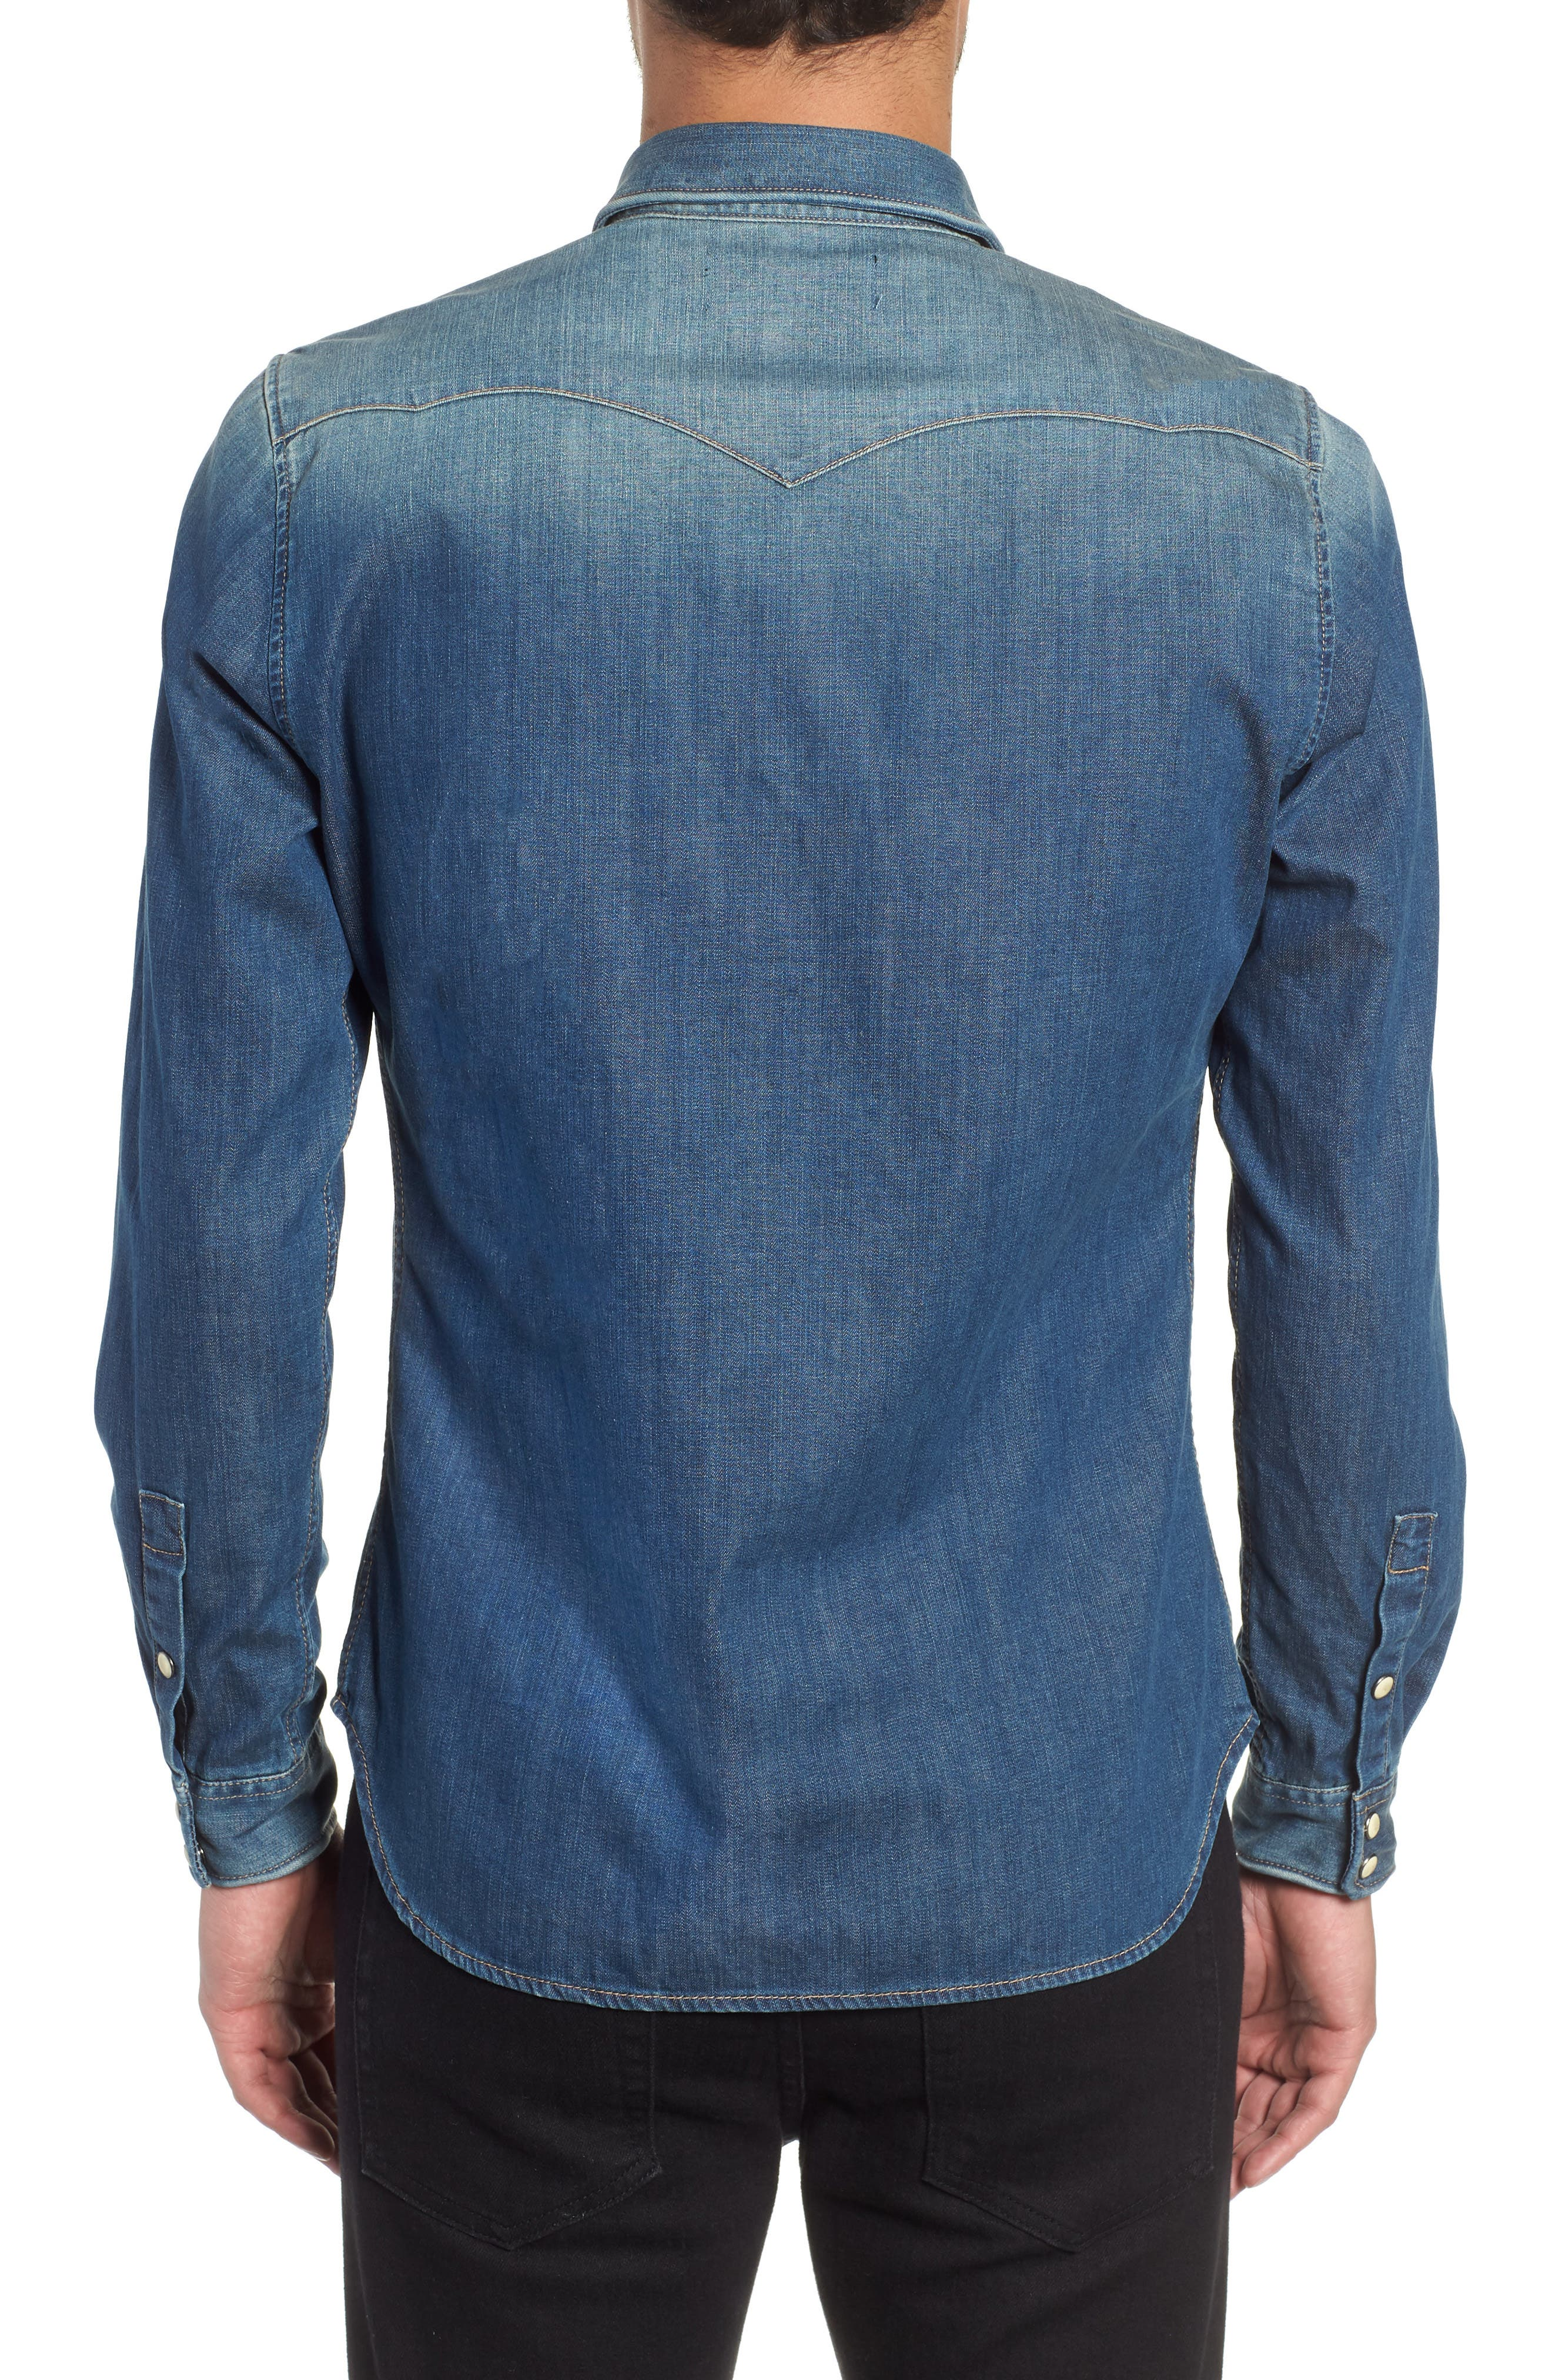 THE KOOPLES,                             Trim Fit Washed Denim Western Shirt,                             Alternate thumbnail 3, color,                             400